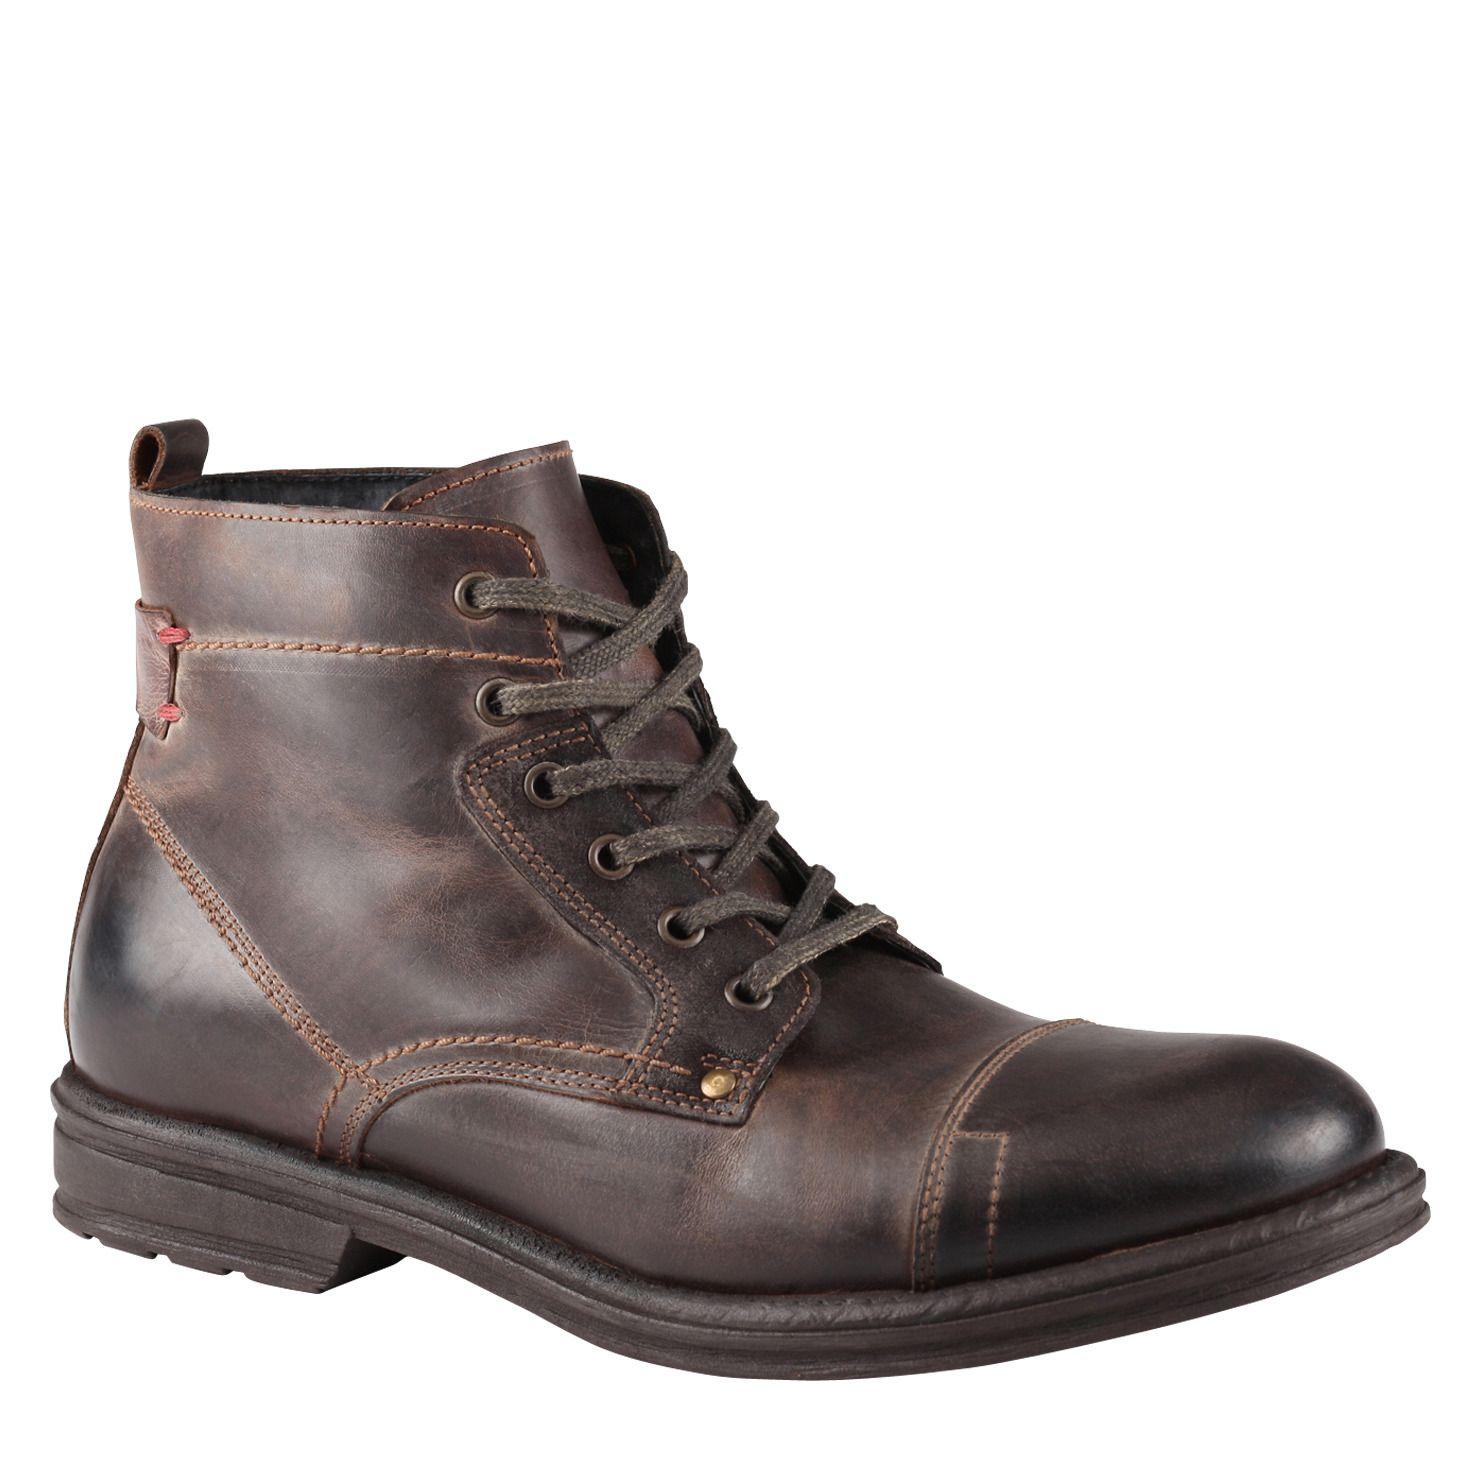 e780d06d TALON - men's casual boots boots for sale at ALDO Shoes. Botas Hombre,  Calzado